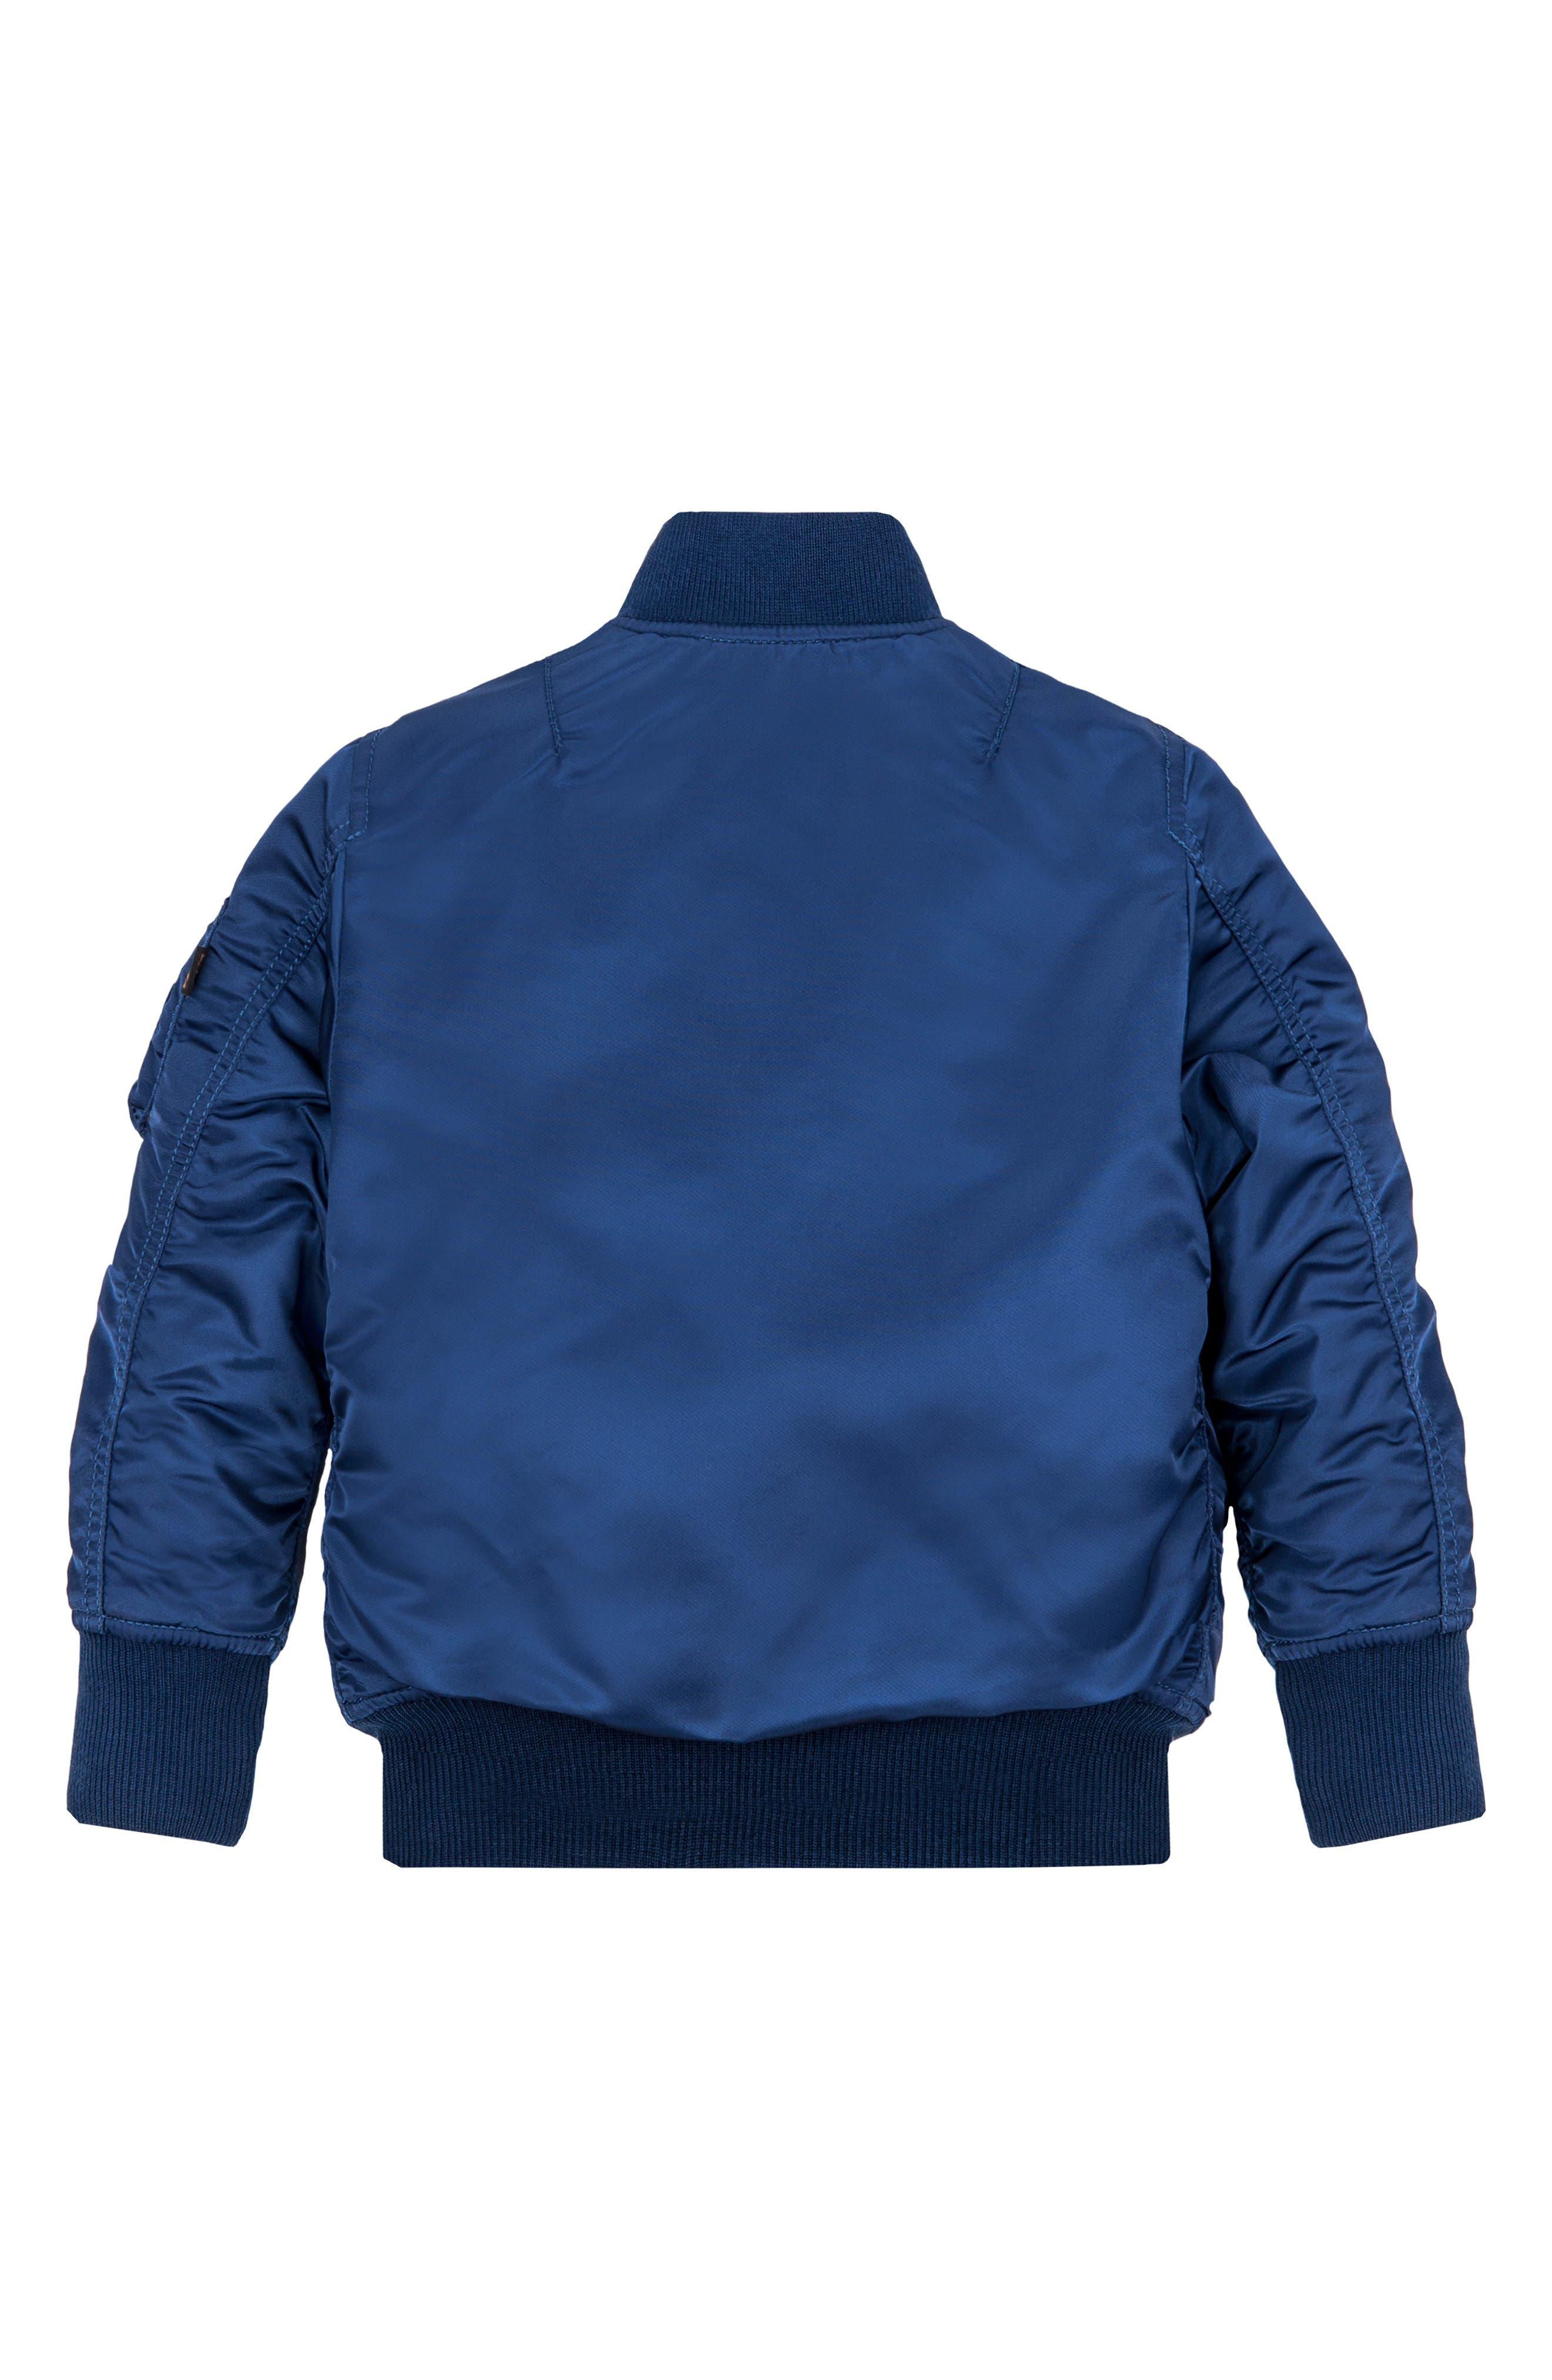 ALPHA INDUSTRIES, MA-1 Patch Flight Jacket, Alternate thumbnail 2, color, BLUE NO 9